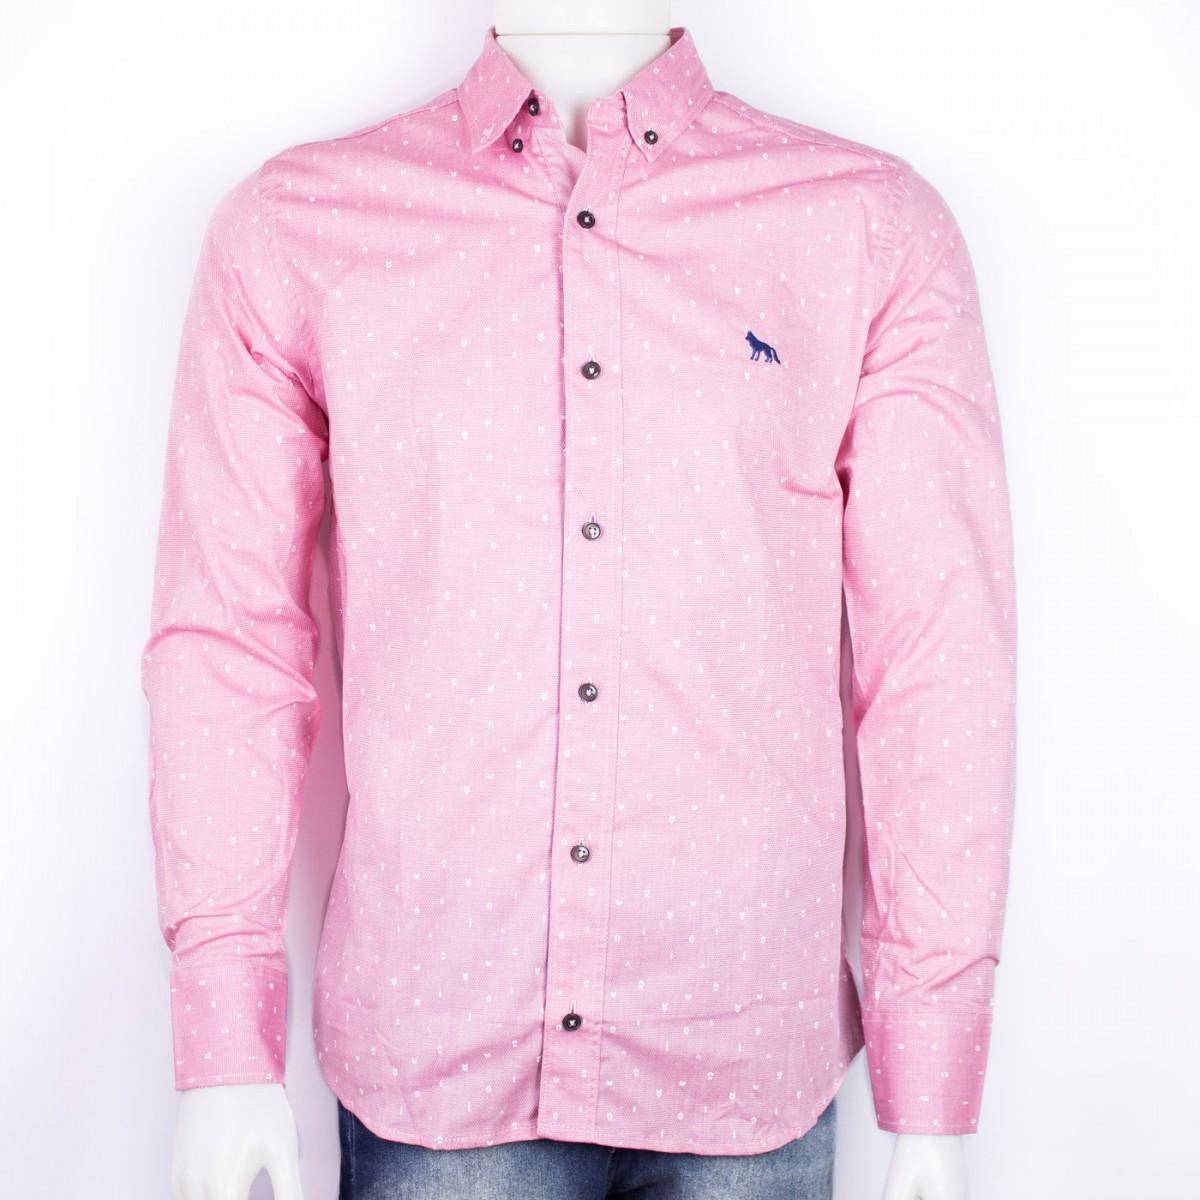 aa123fa9b4cb9 Bizz Store - Camisa Social Masculina Acostamento Rosa Vintage